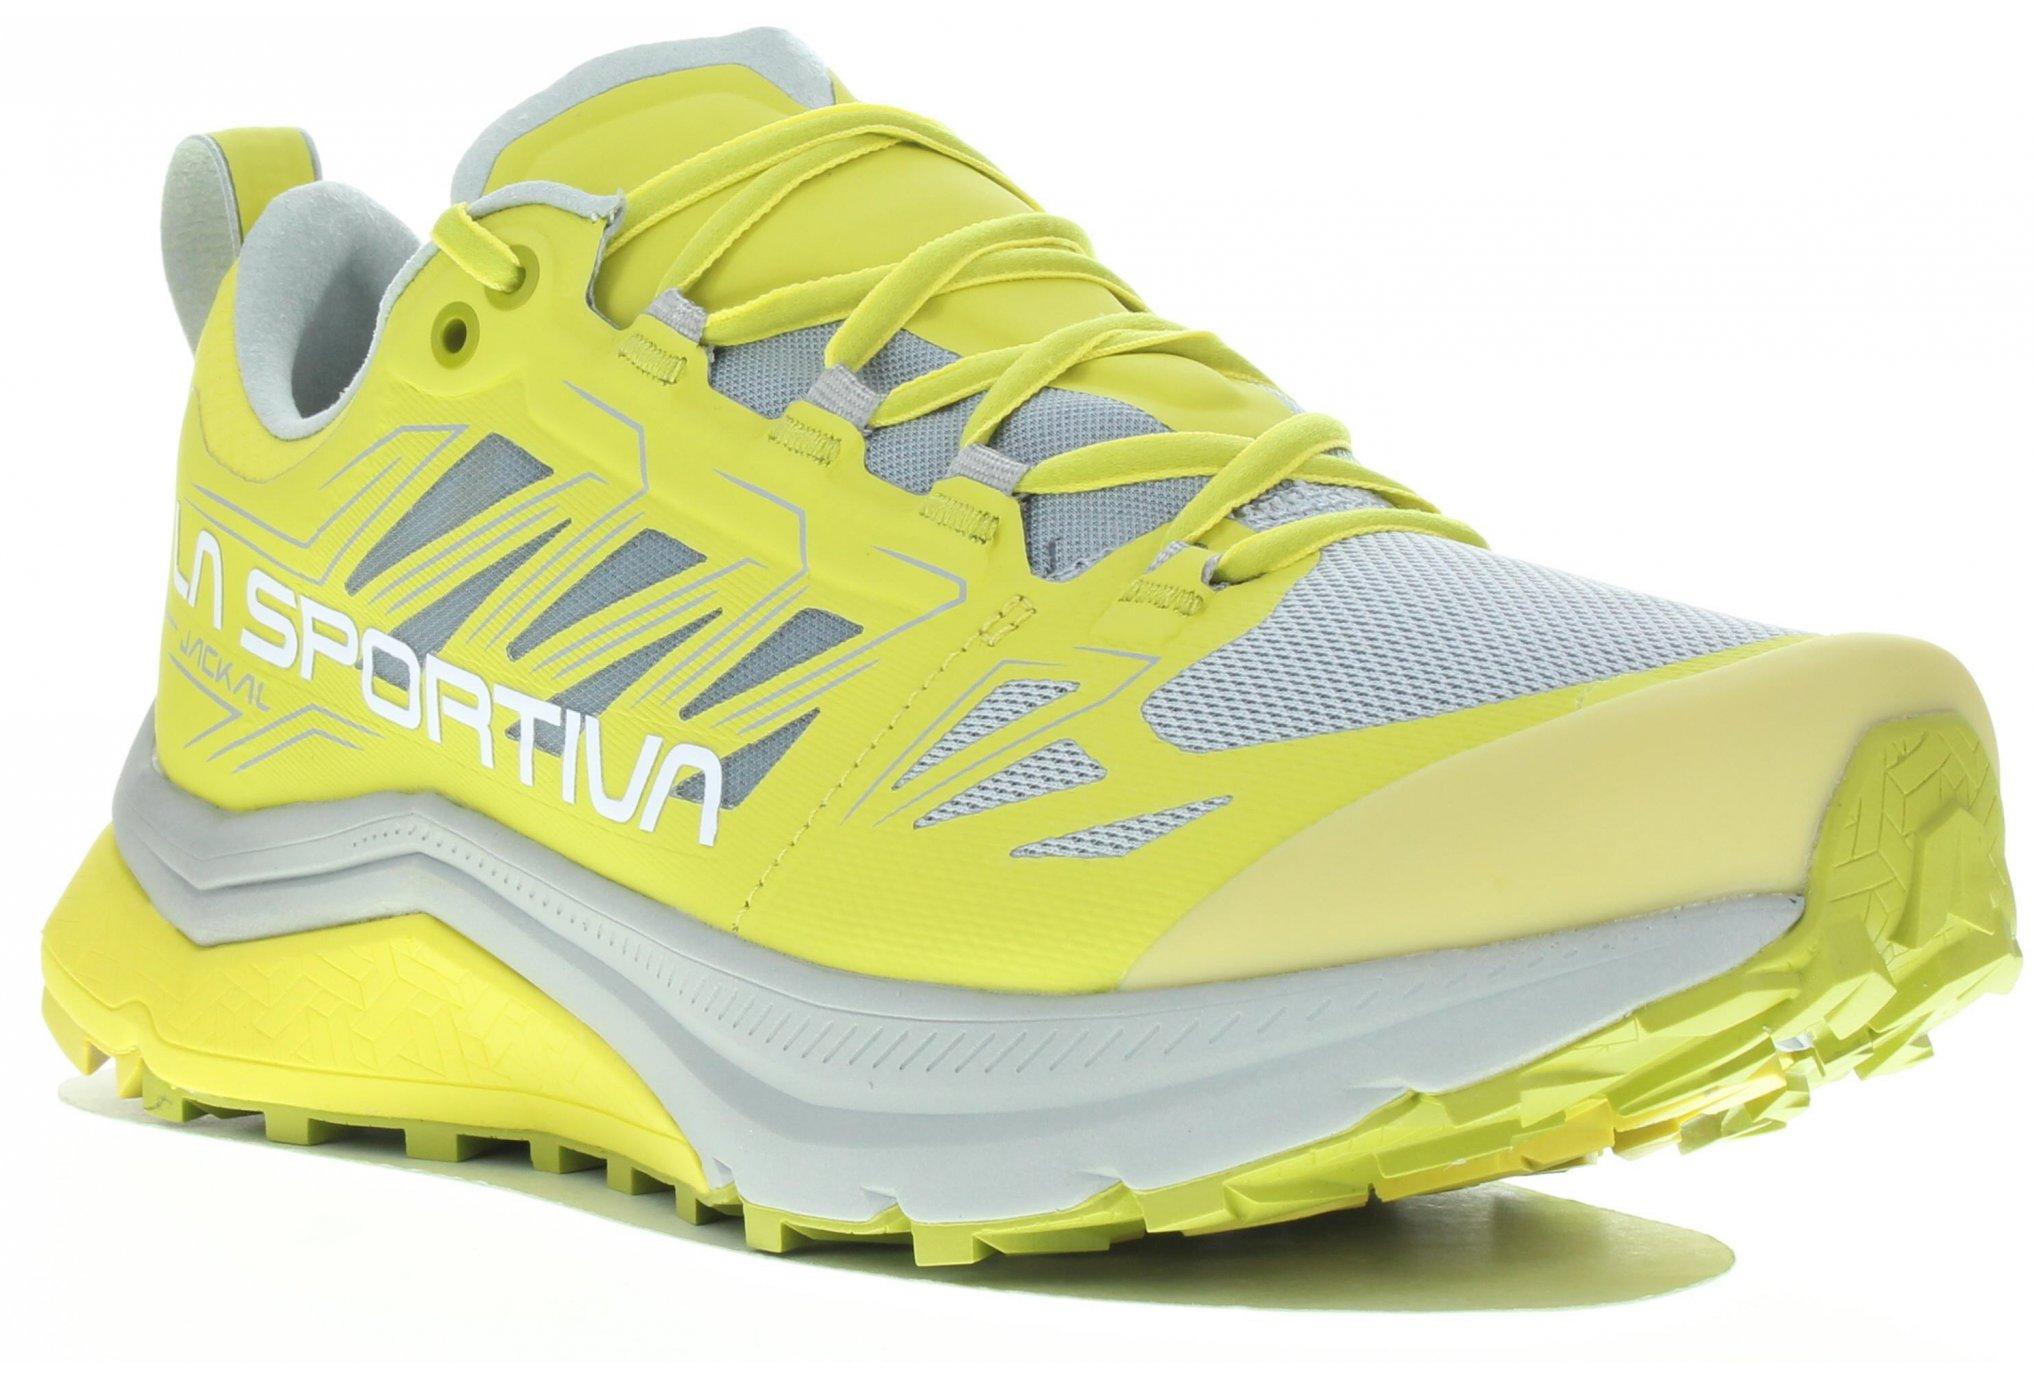 La Sportiva Jackal Chaussures running femme